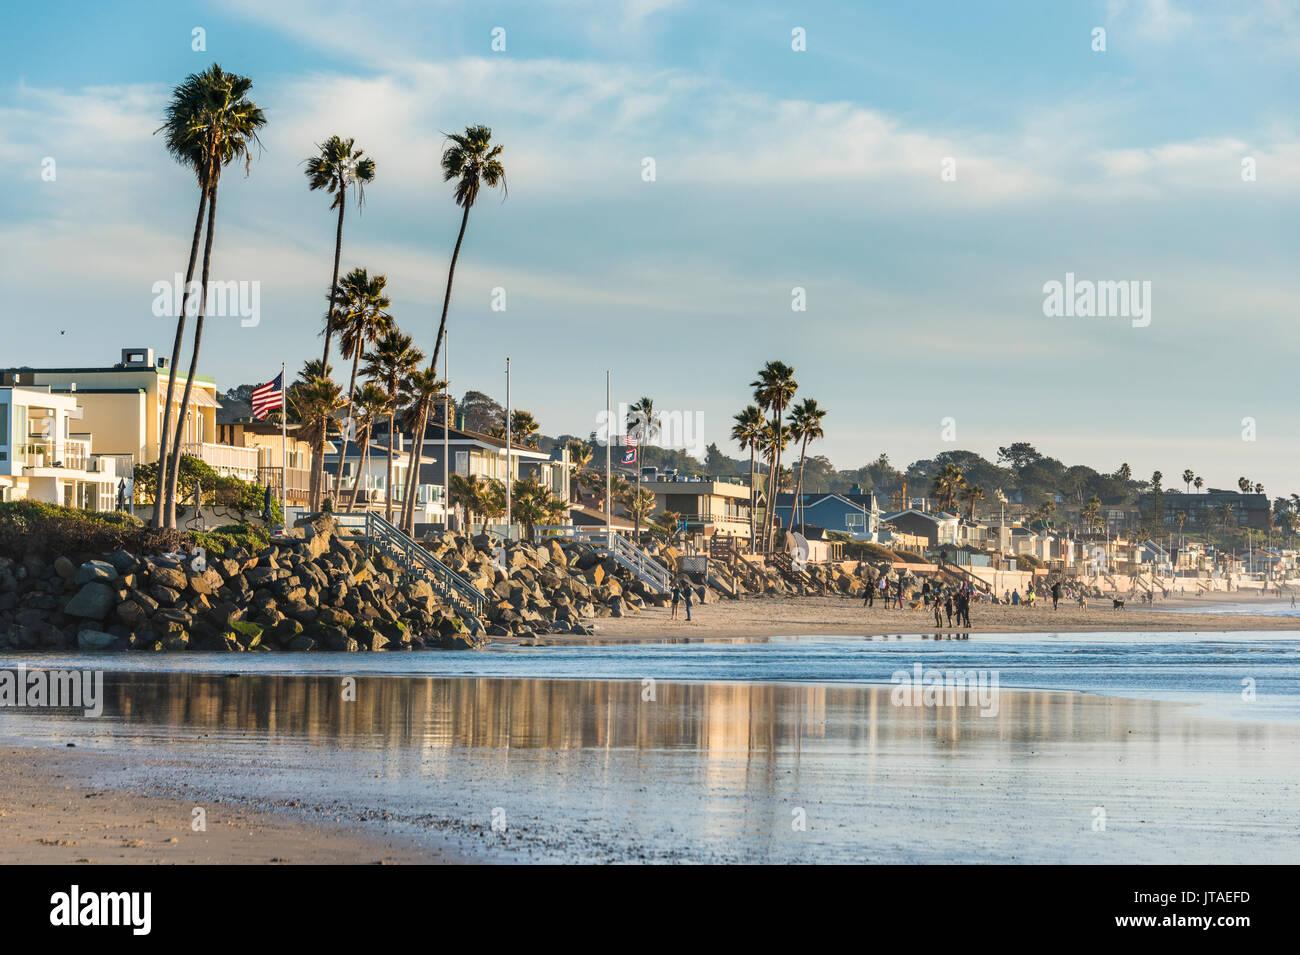 The beach of Del Mar, California, United States of America, North America - Stock Image